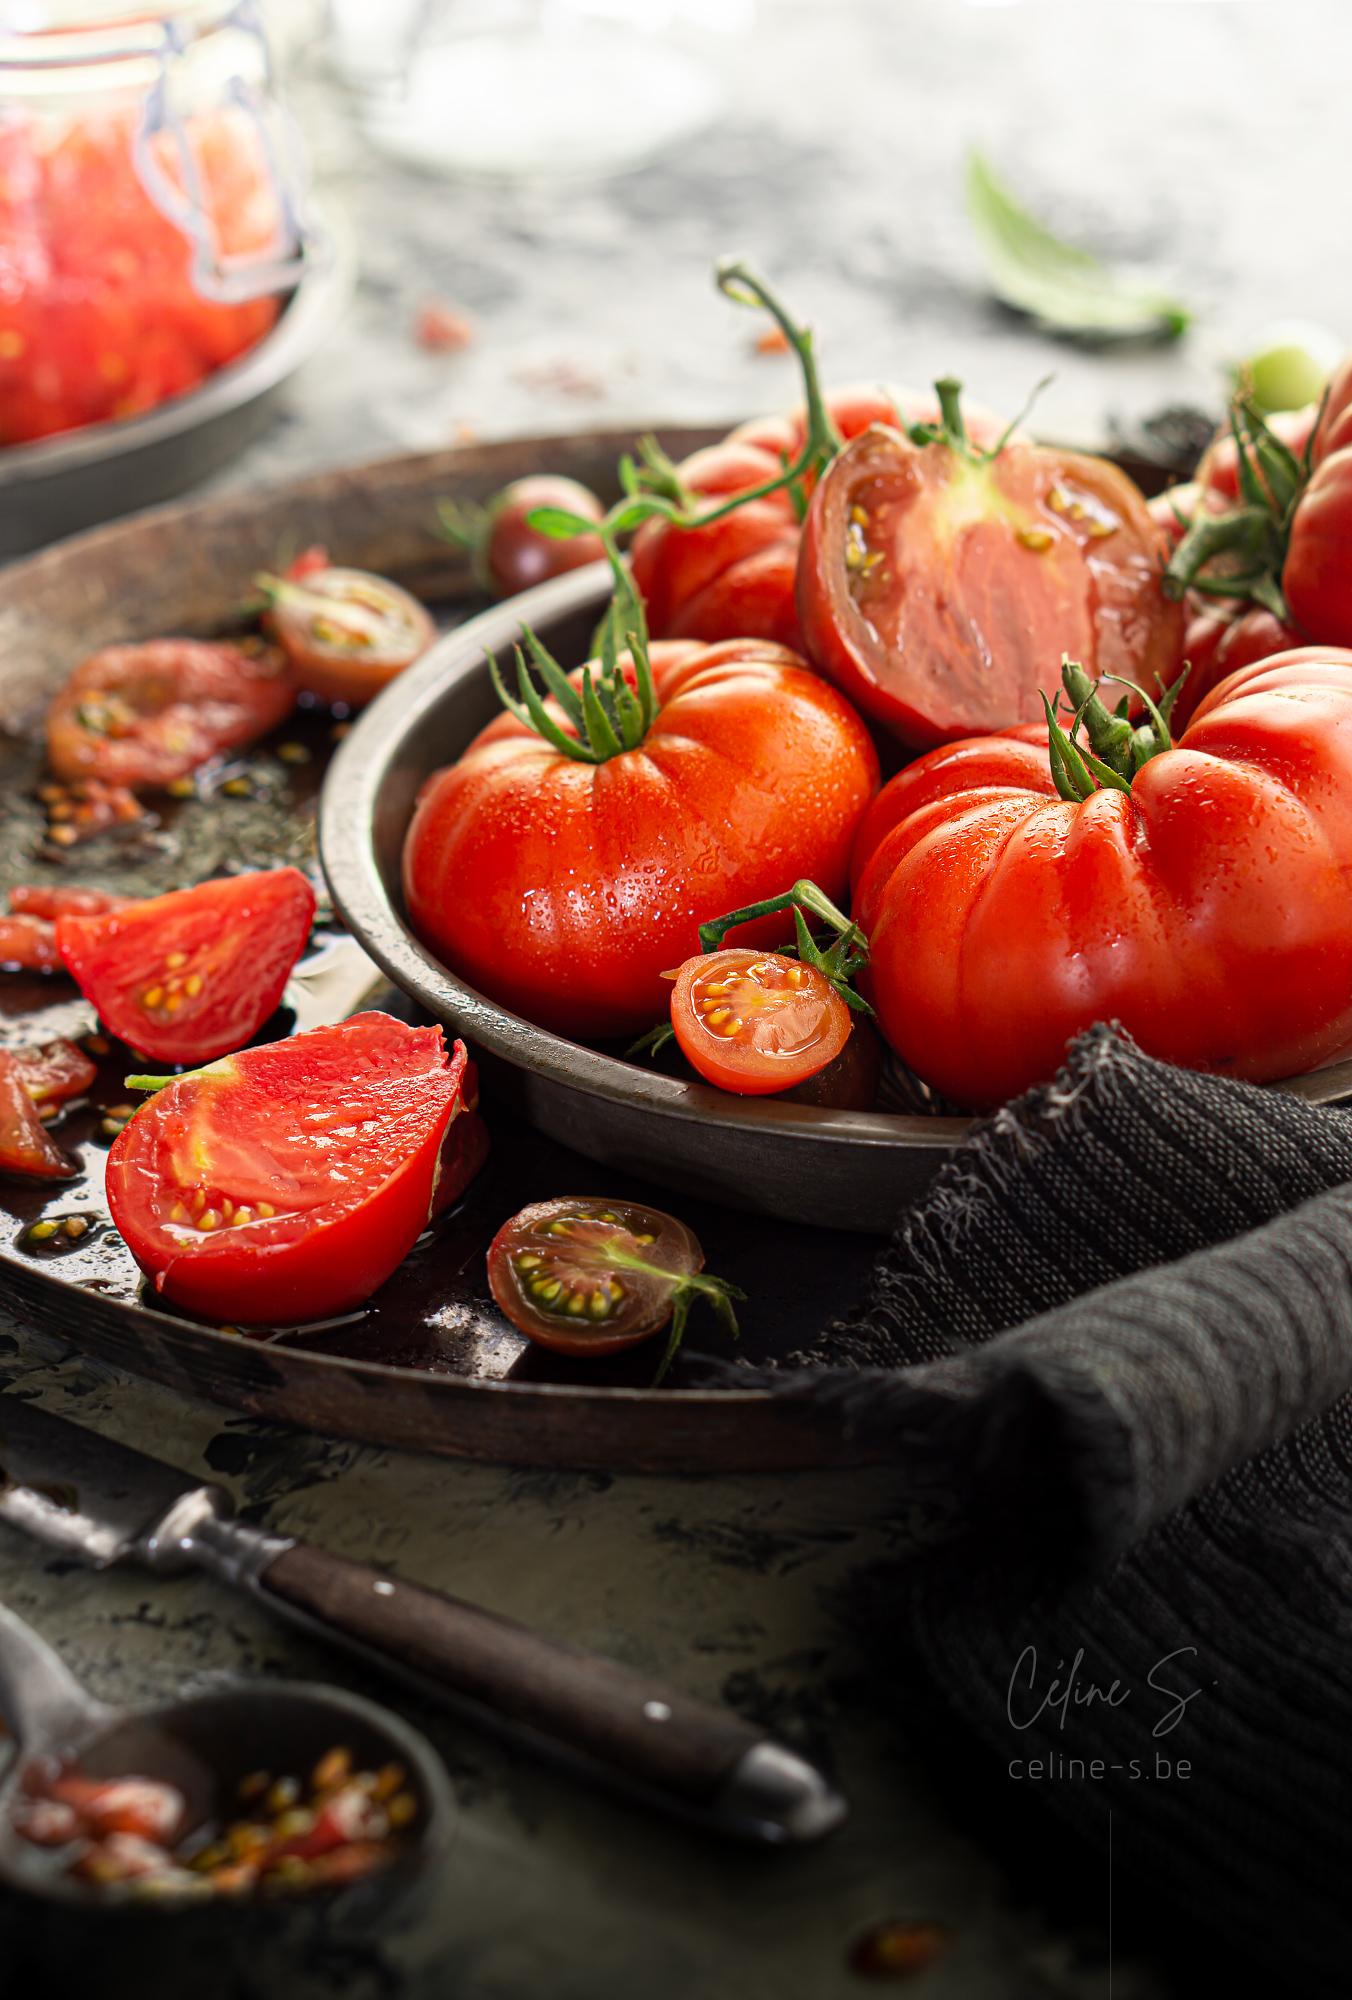 Céline stiévenard - photographe styliste food - tomates